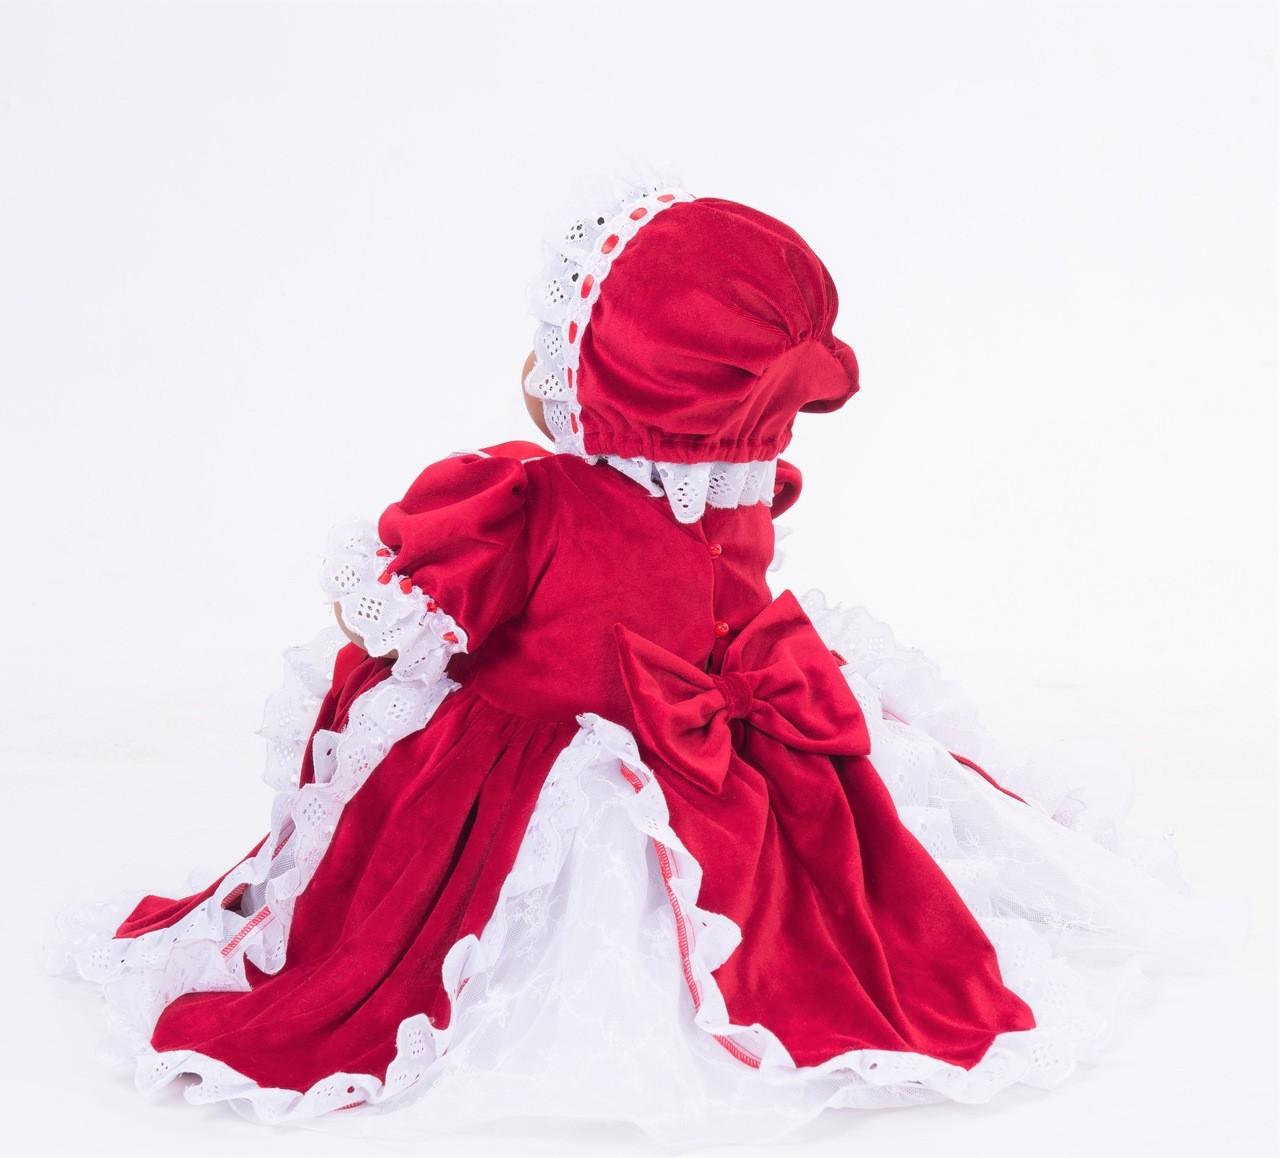 Fantasia Vestido Renda Vintage Natal